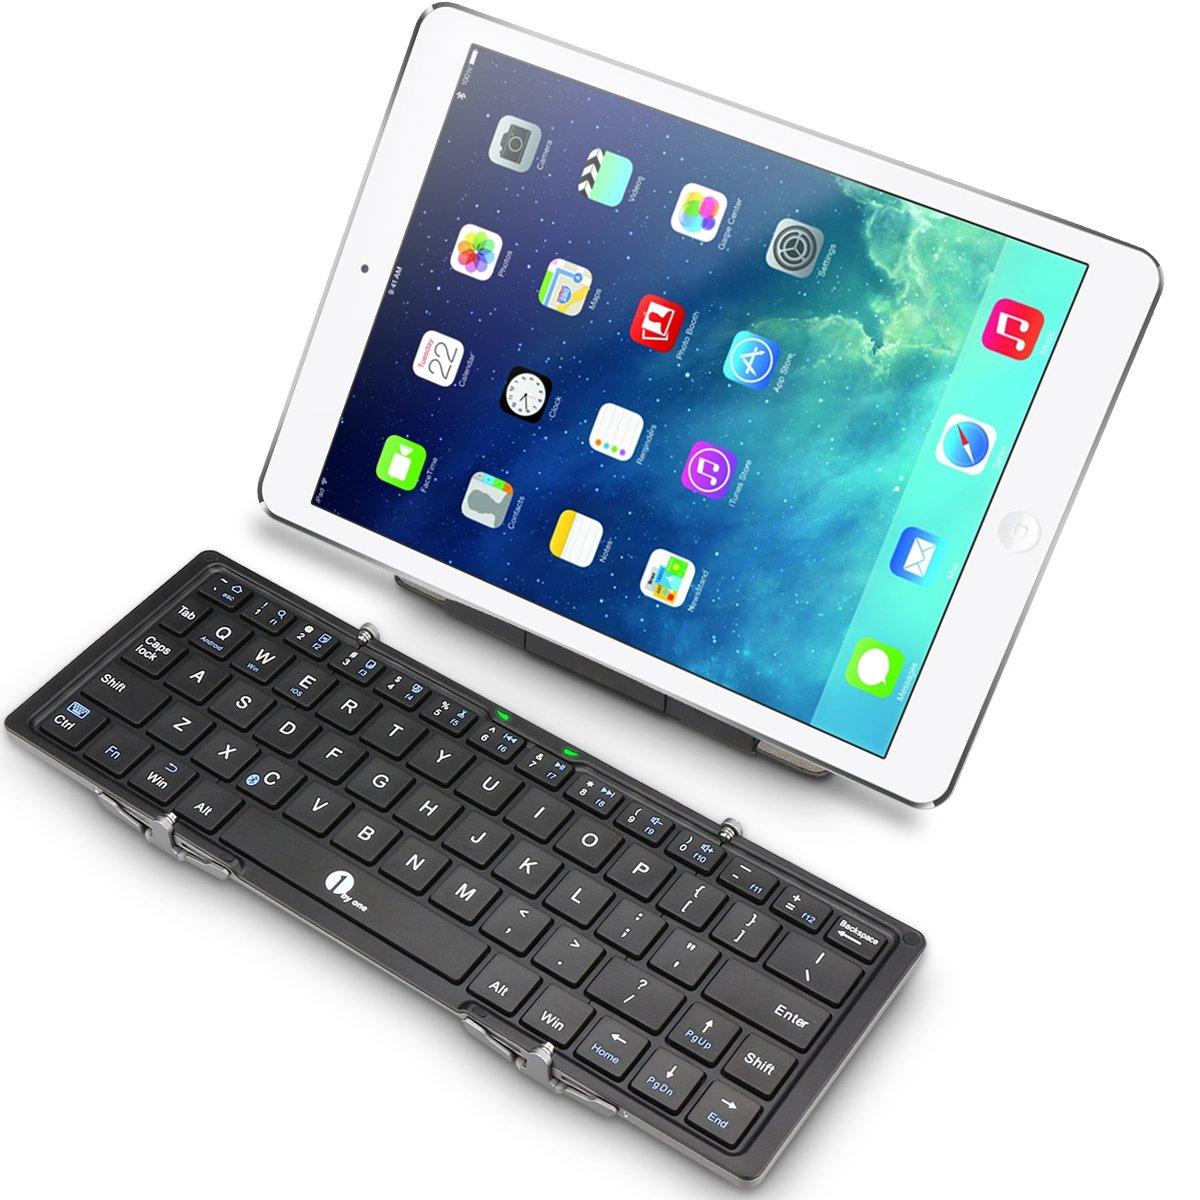 ss429 1byone faltbare schutzh lle f r faltbare bluetooth tastatur ebay. Black Bedroom Furniture Sets. Home Design Ideas